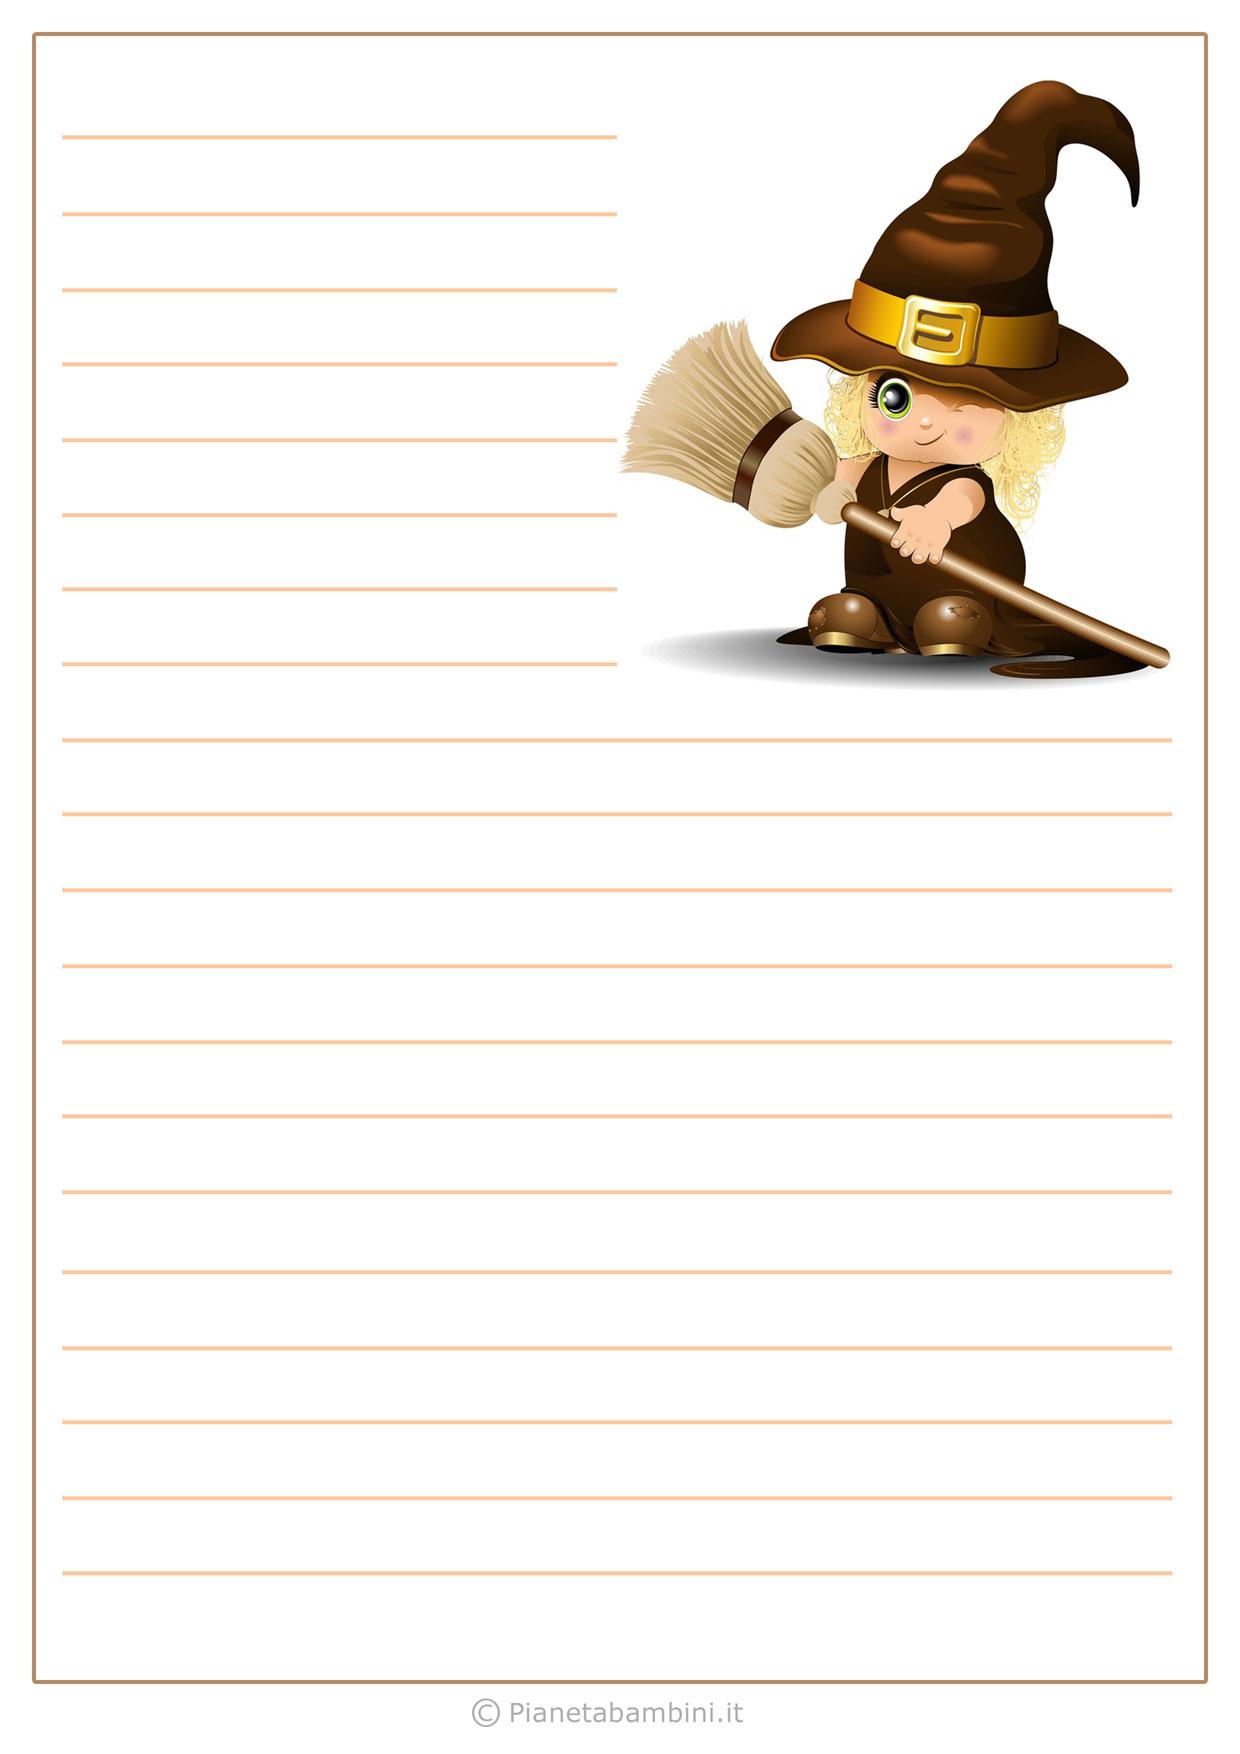 Lettera alla Befana da stampare n.6